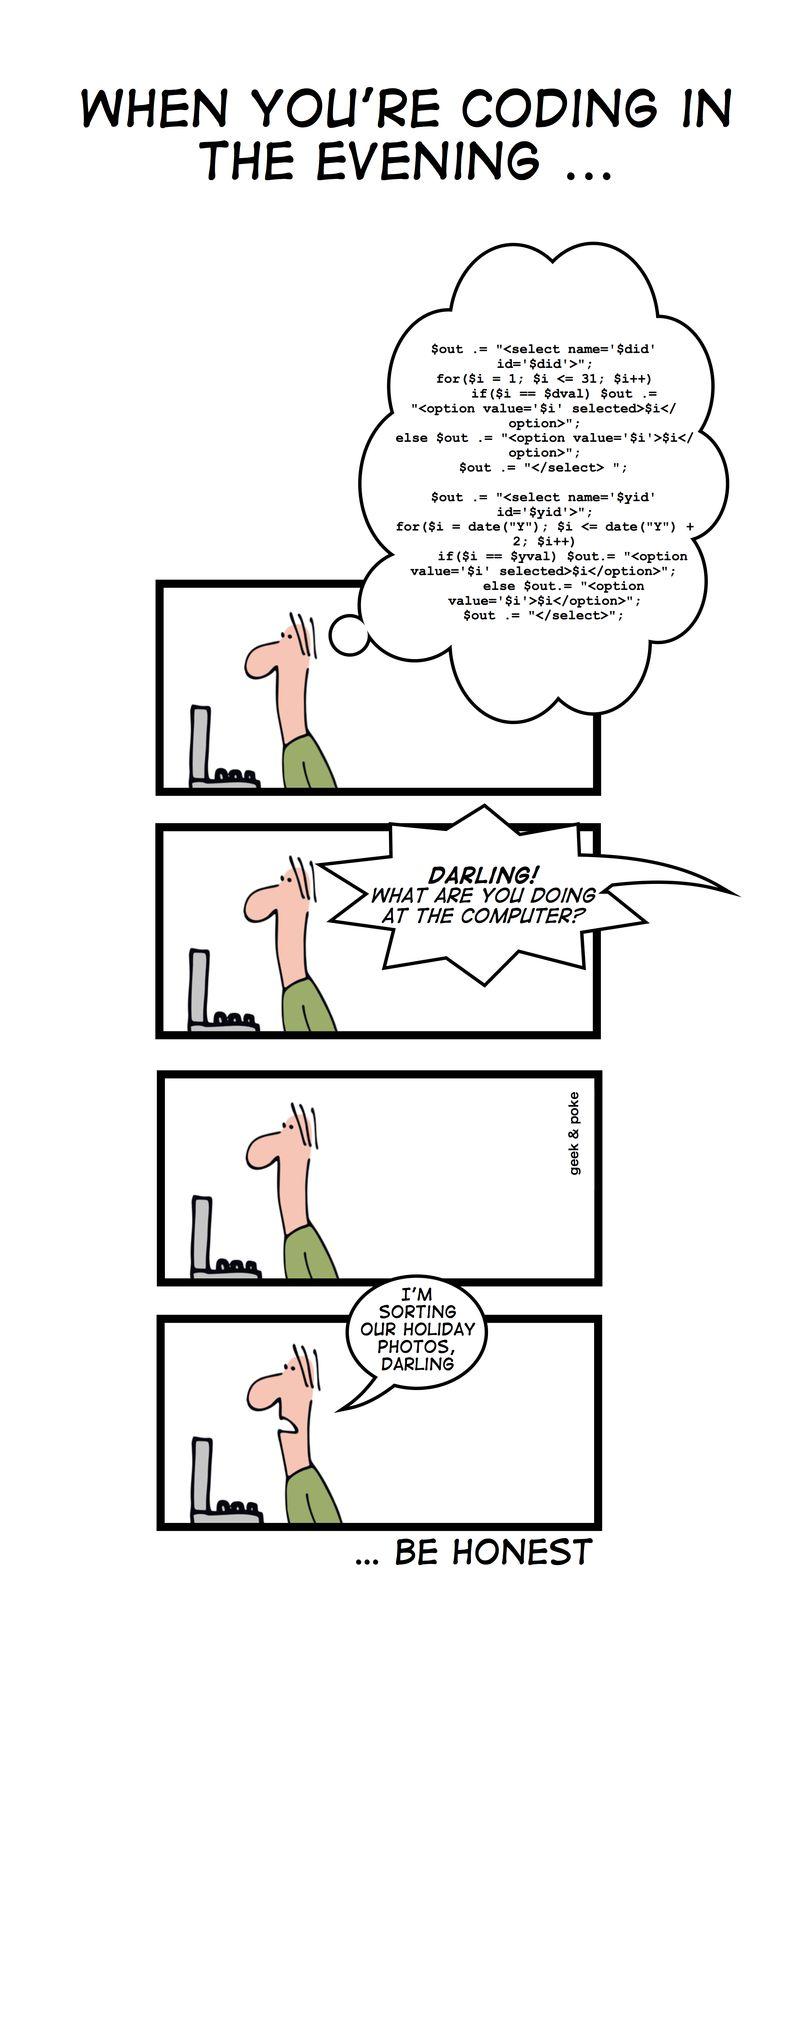 bande dessinée geek & poke lol humour developpeurs